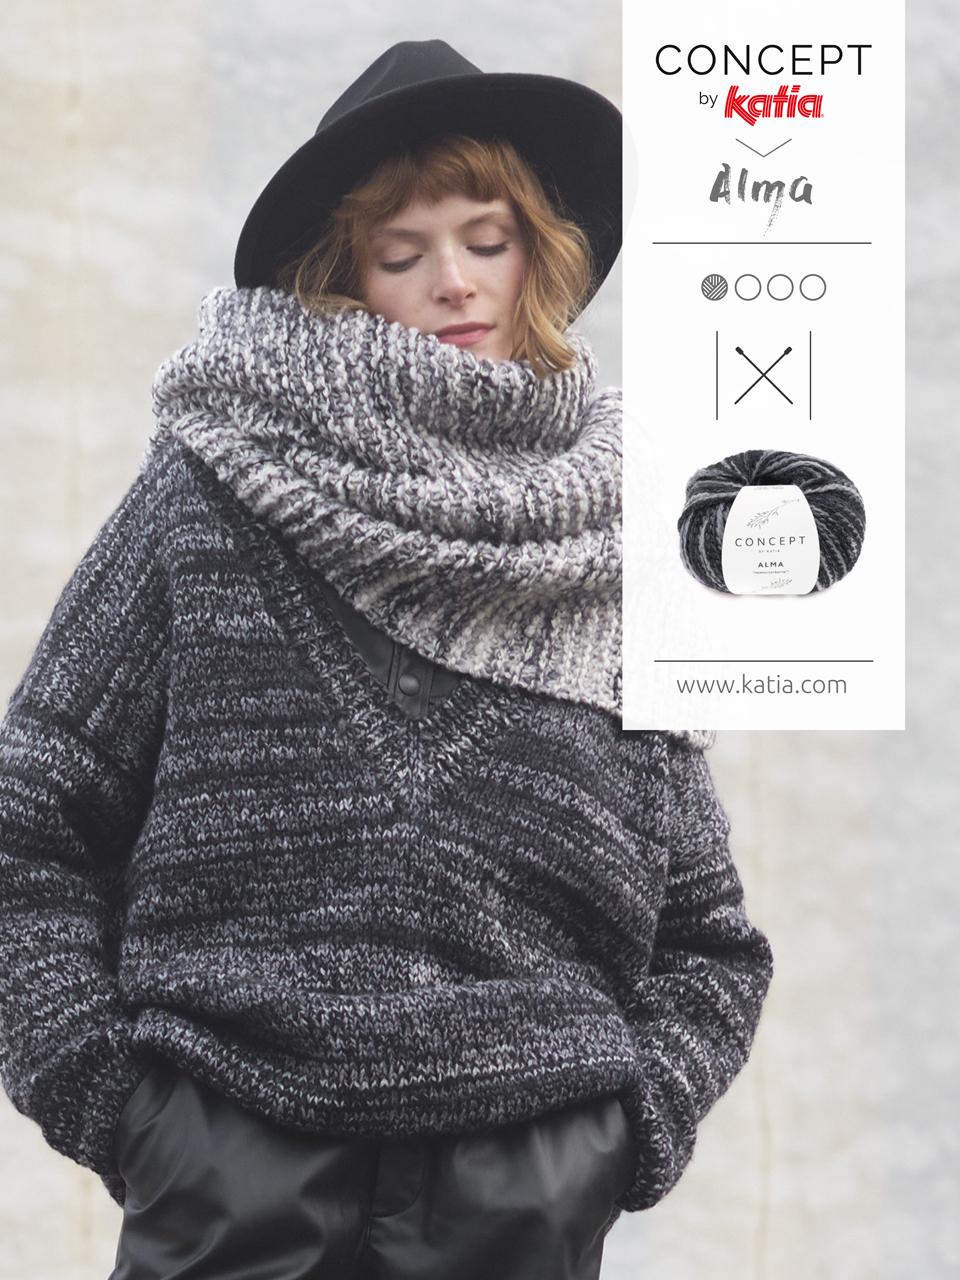 Concept-by-Katia-Alma-Pullover-Cowl